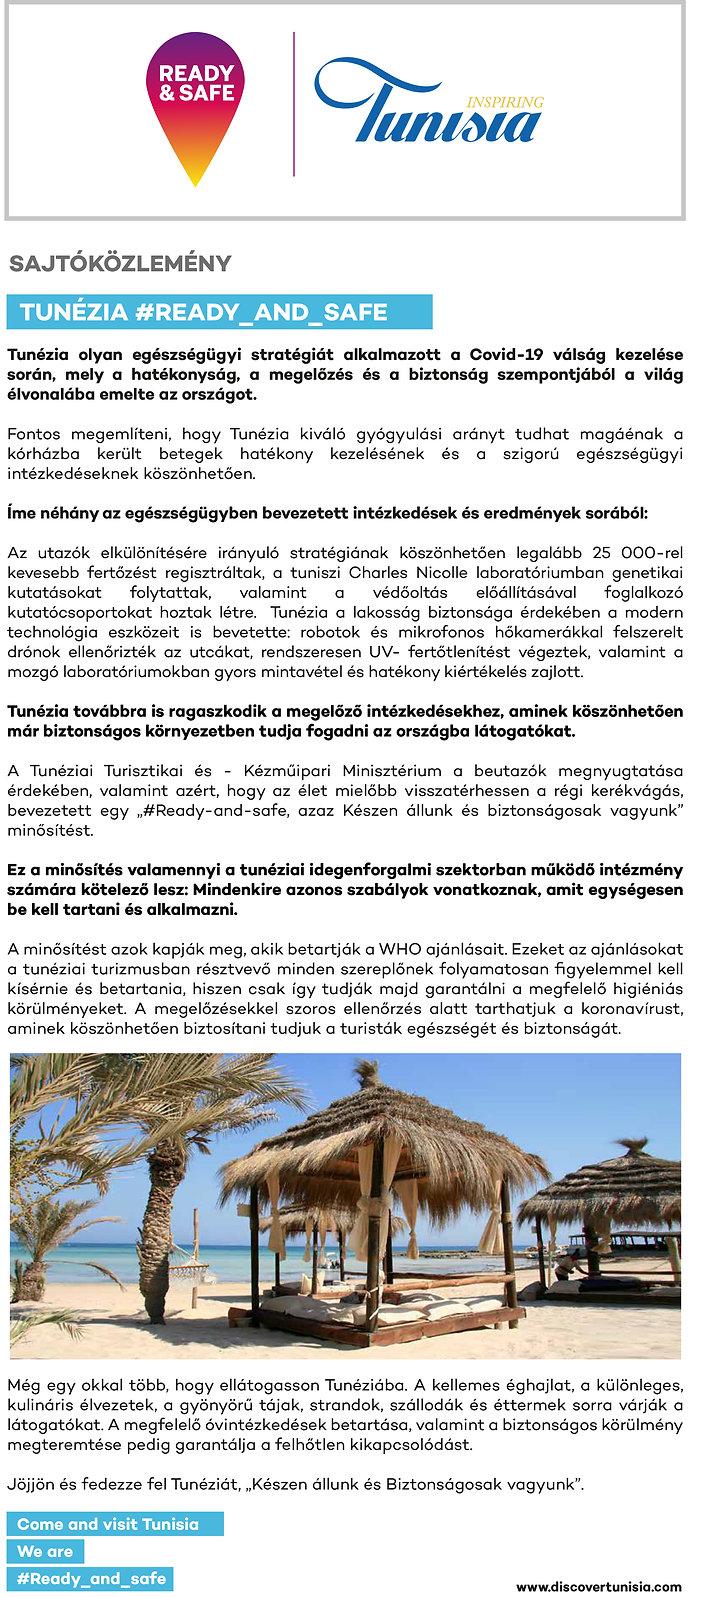 Sajtokozlemeny - Tunezia Idegenforgalmi